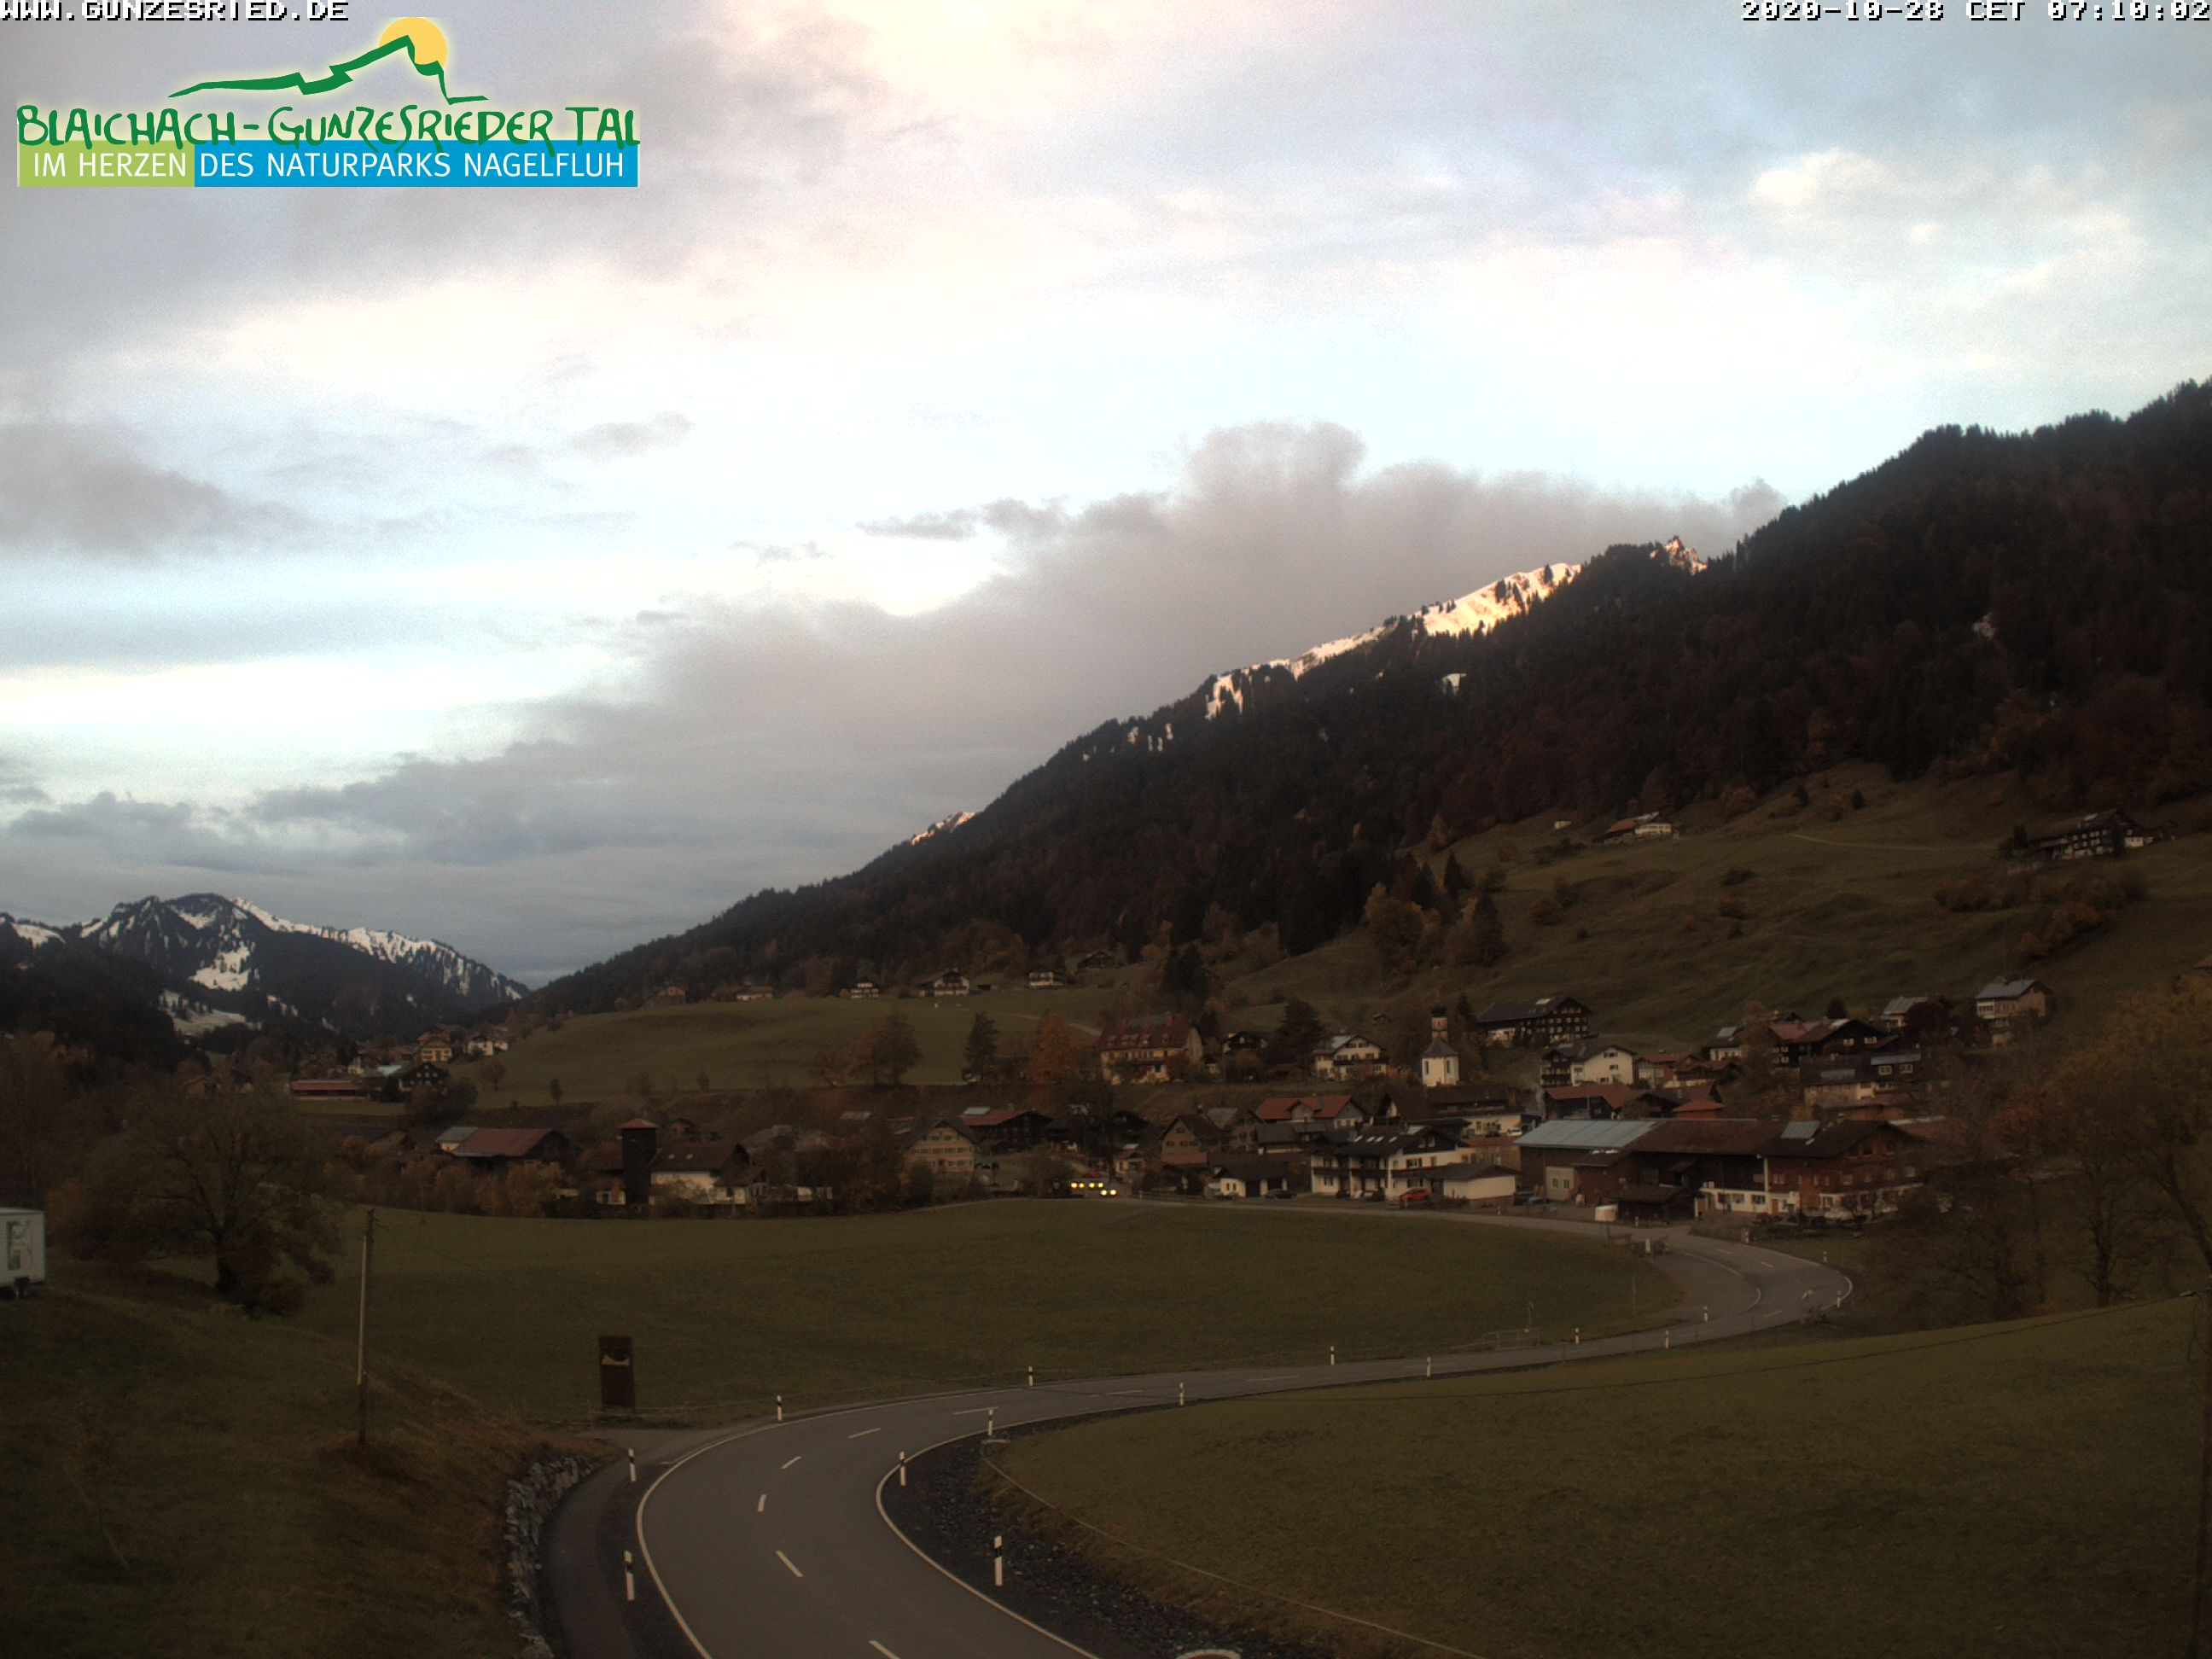 Webcam Gunzenrieder Tal in Blaichach